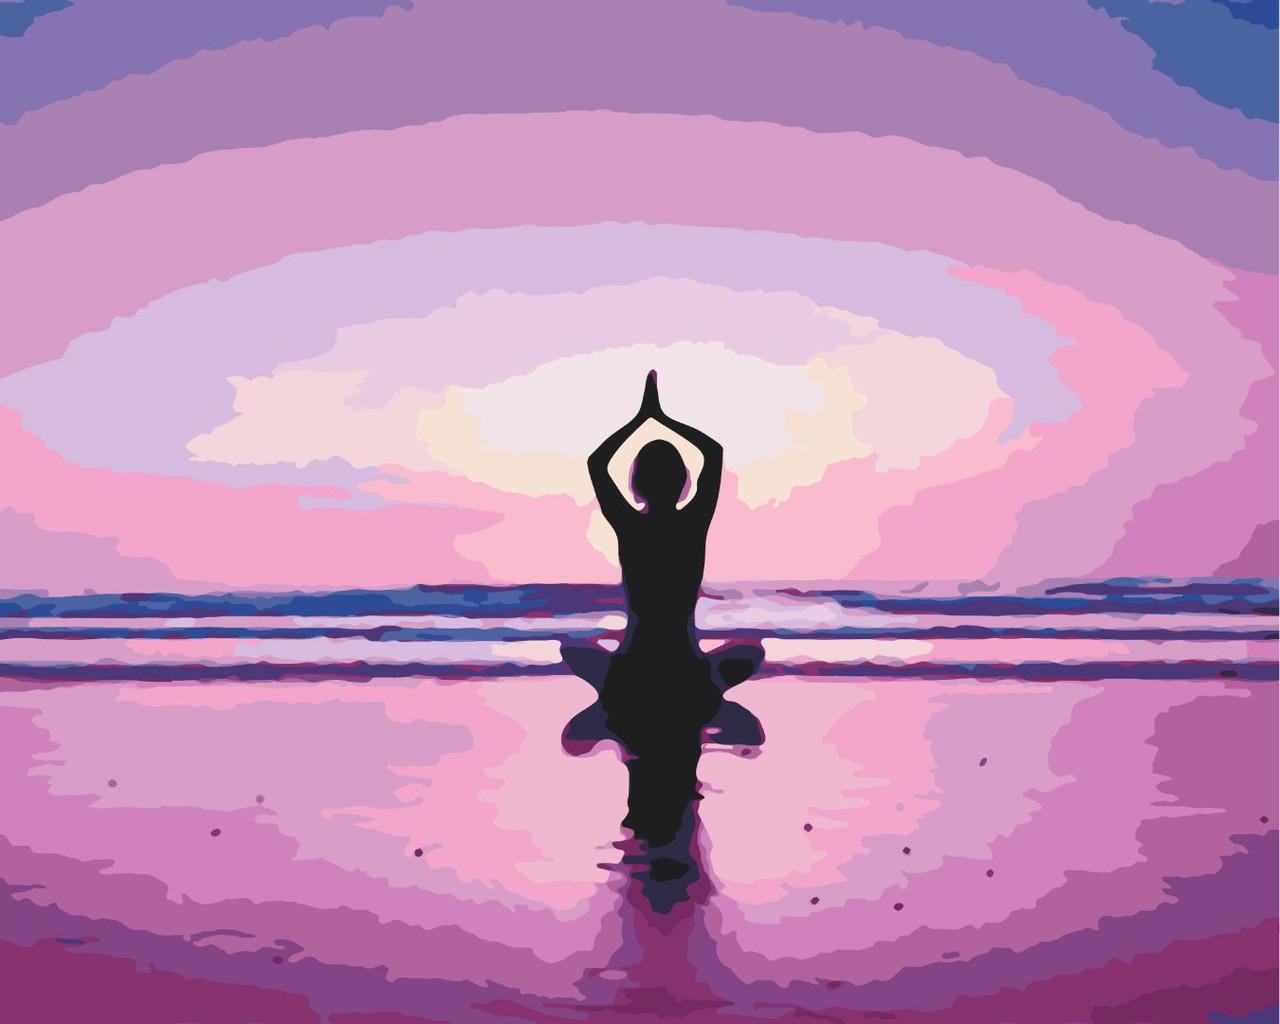 Картина по номерам - Медитативная практика 2 Brushme 40*50 см. (GX34816)